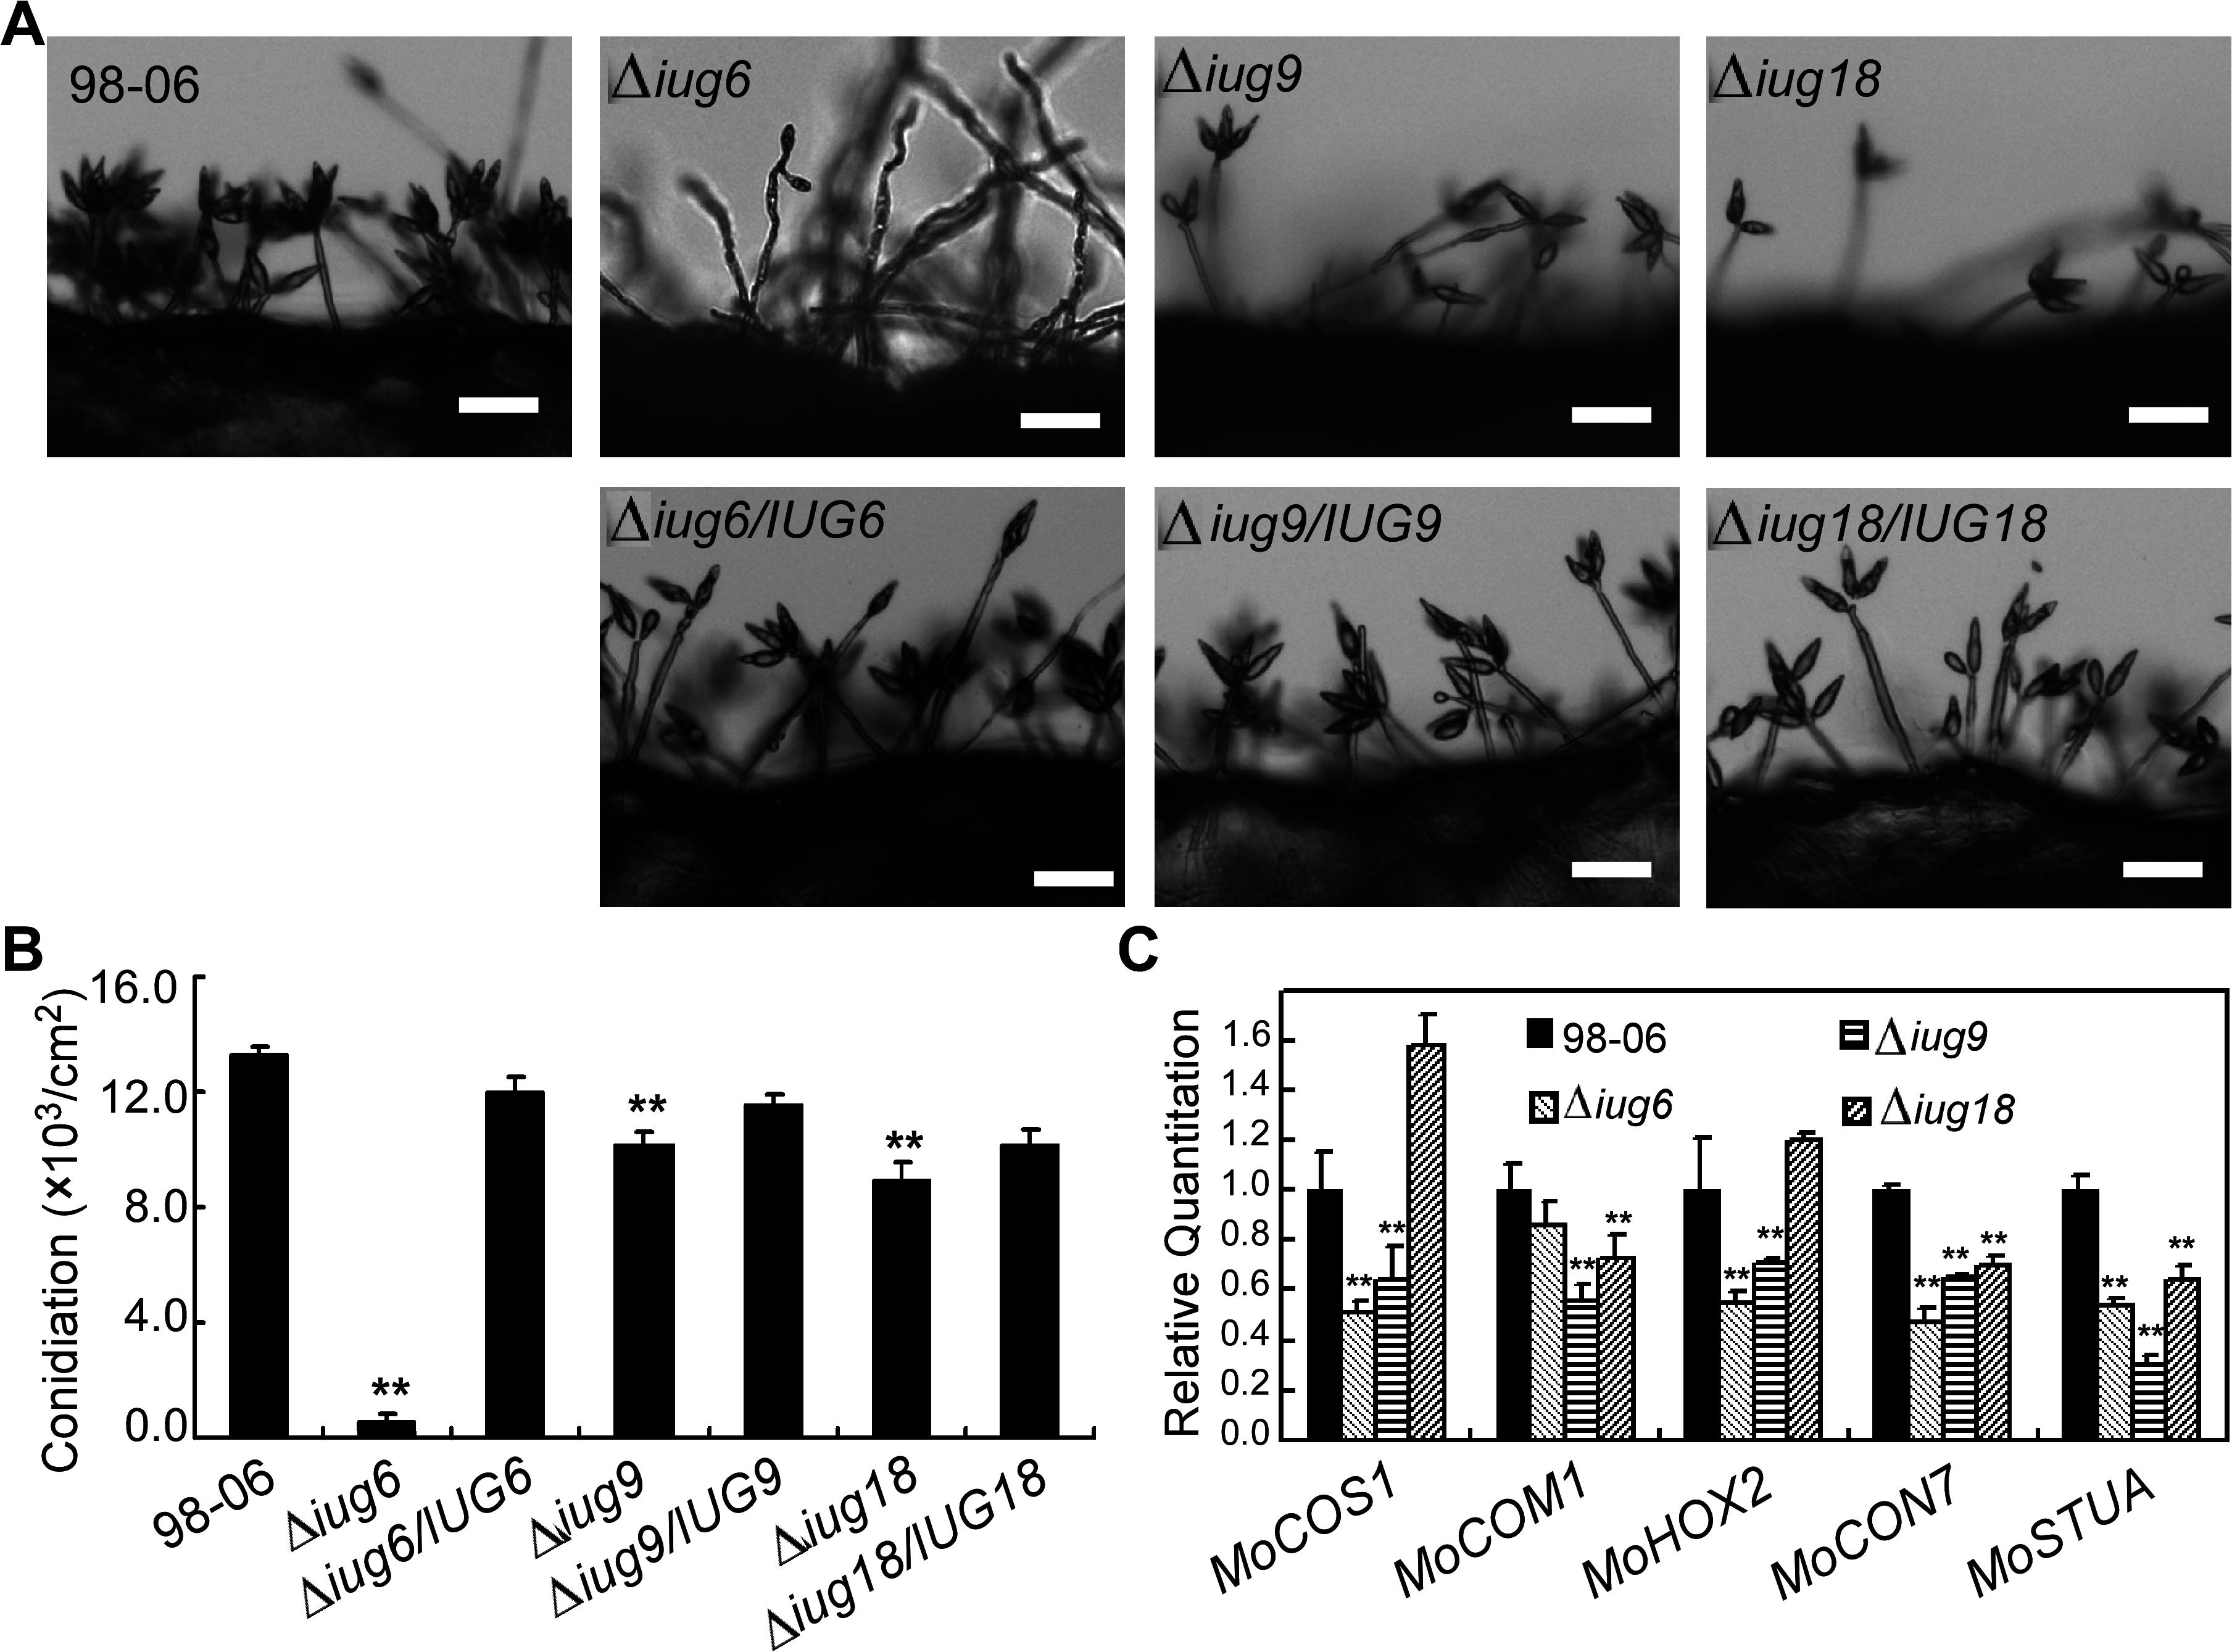 Disruption of <i>IUG</i> genes lead to reduced conidiation.